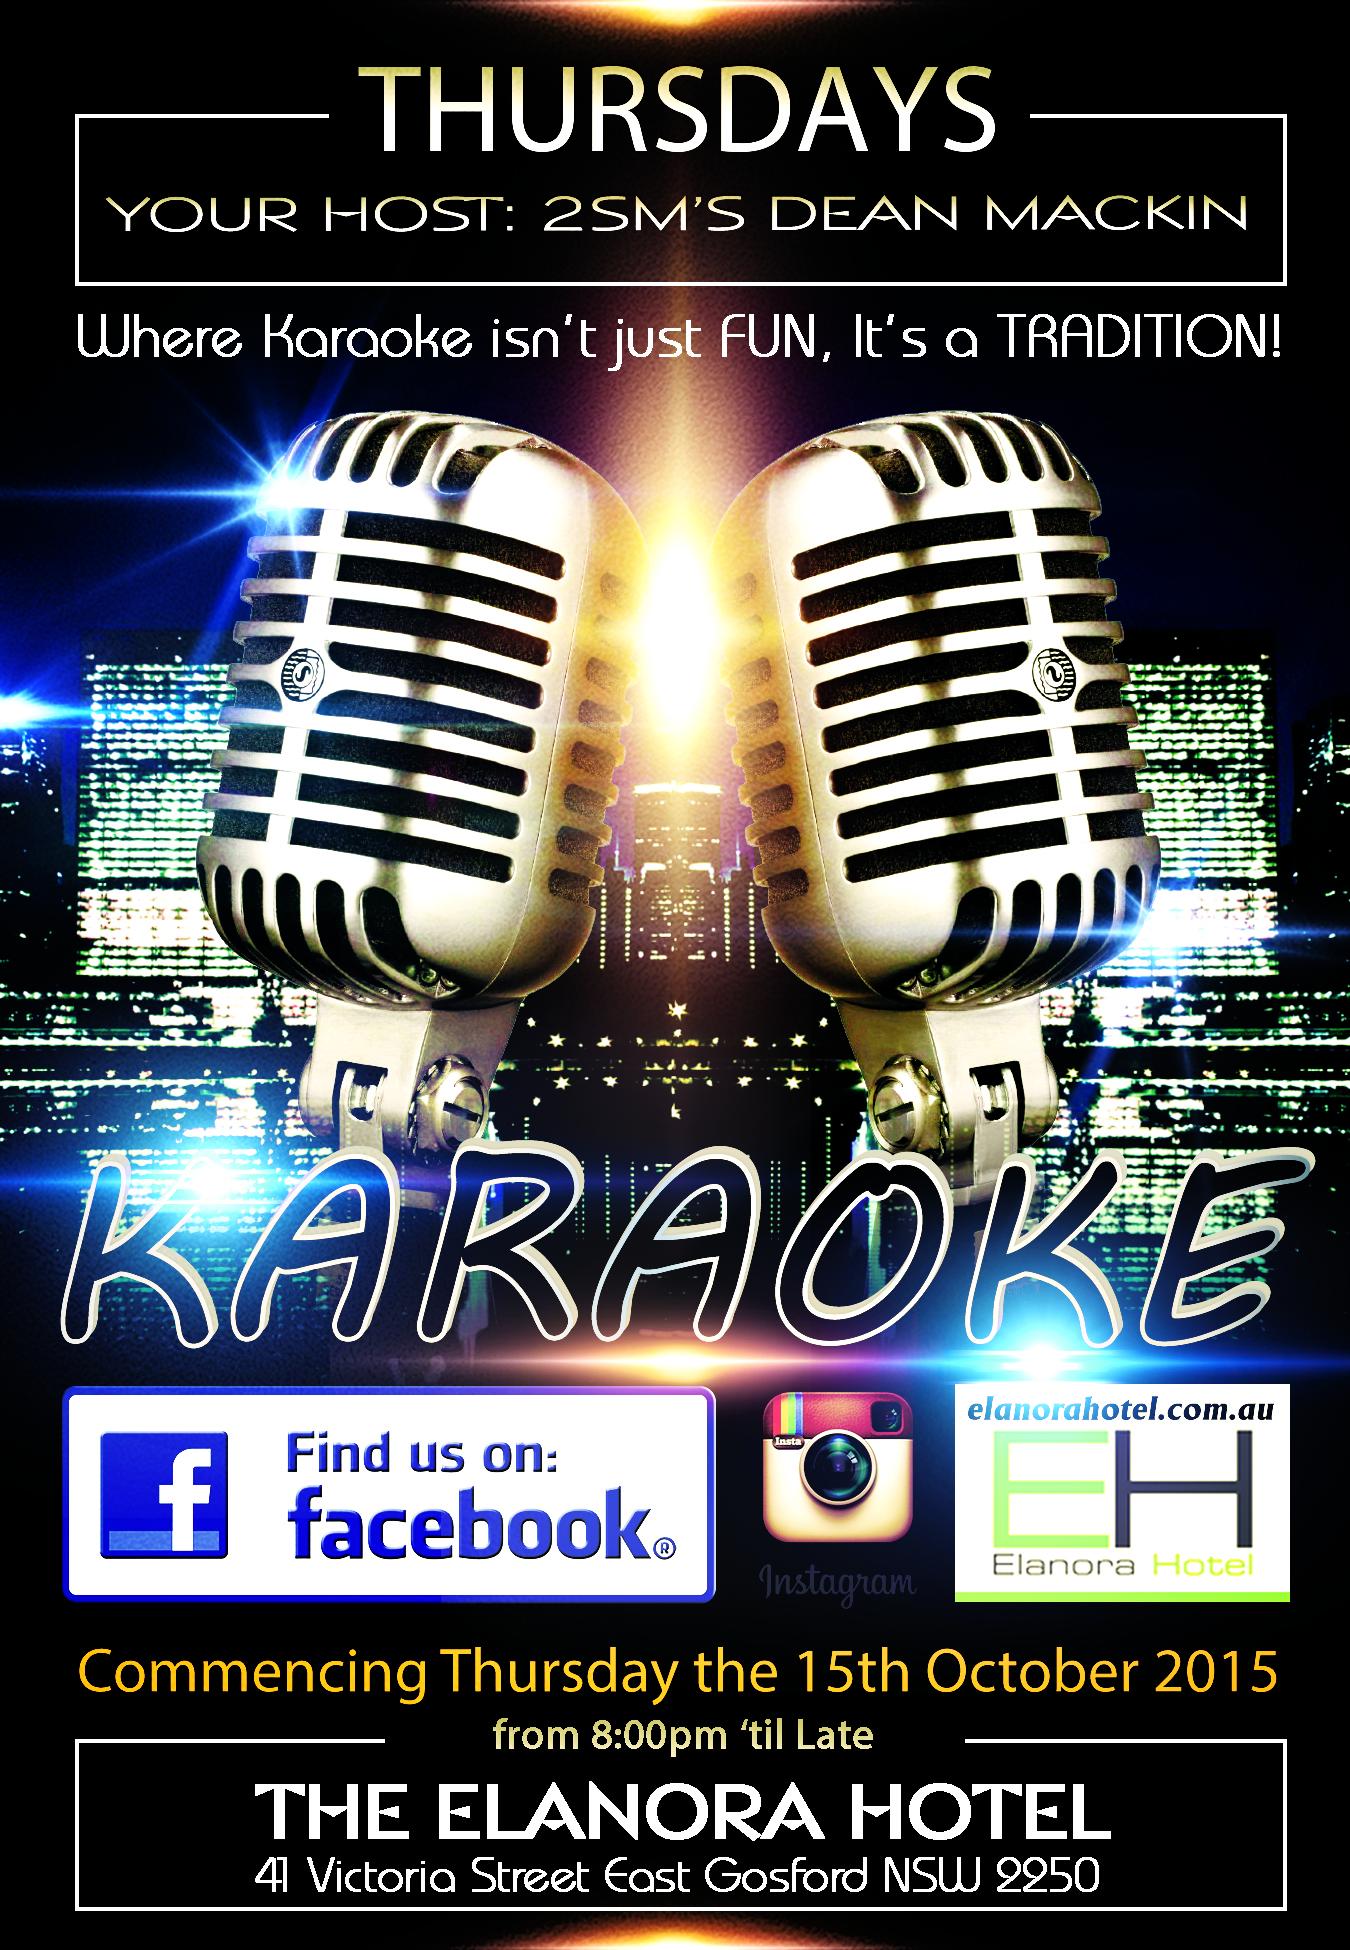 Elanora Hotel Karaoke Every Thursday Night